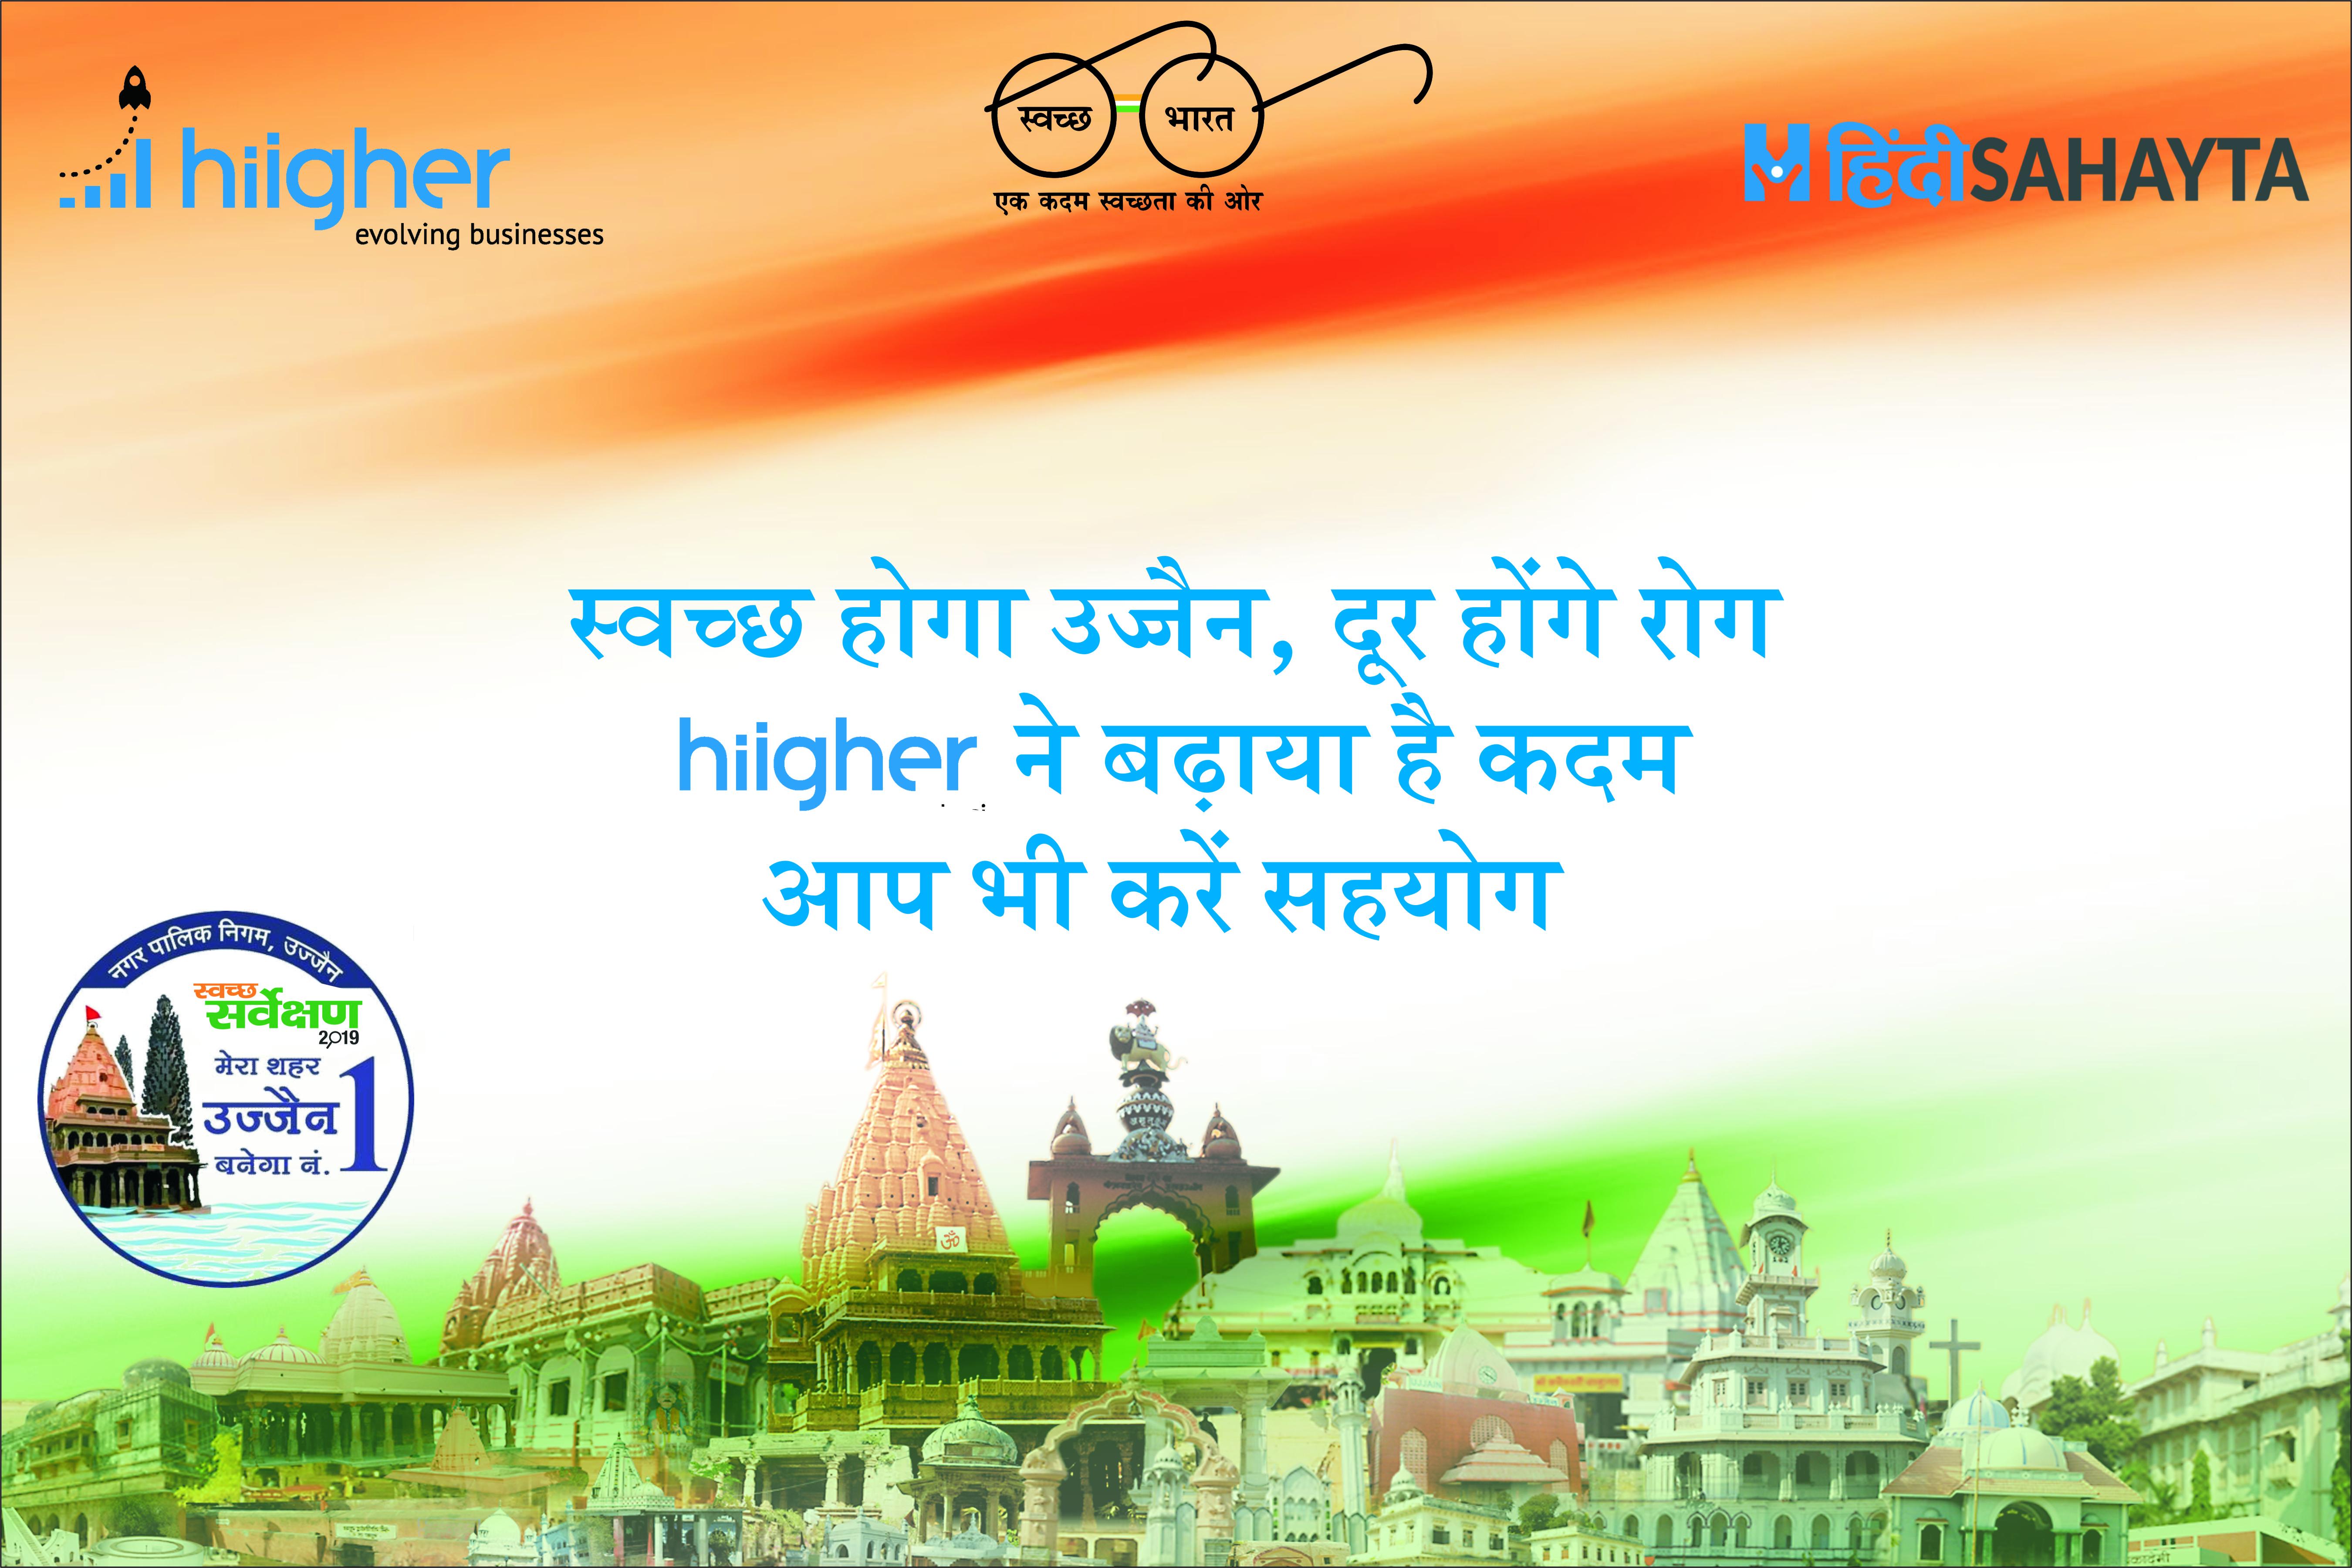 Hiigher Swachhta Sarvekshan Banner